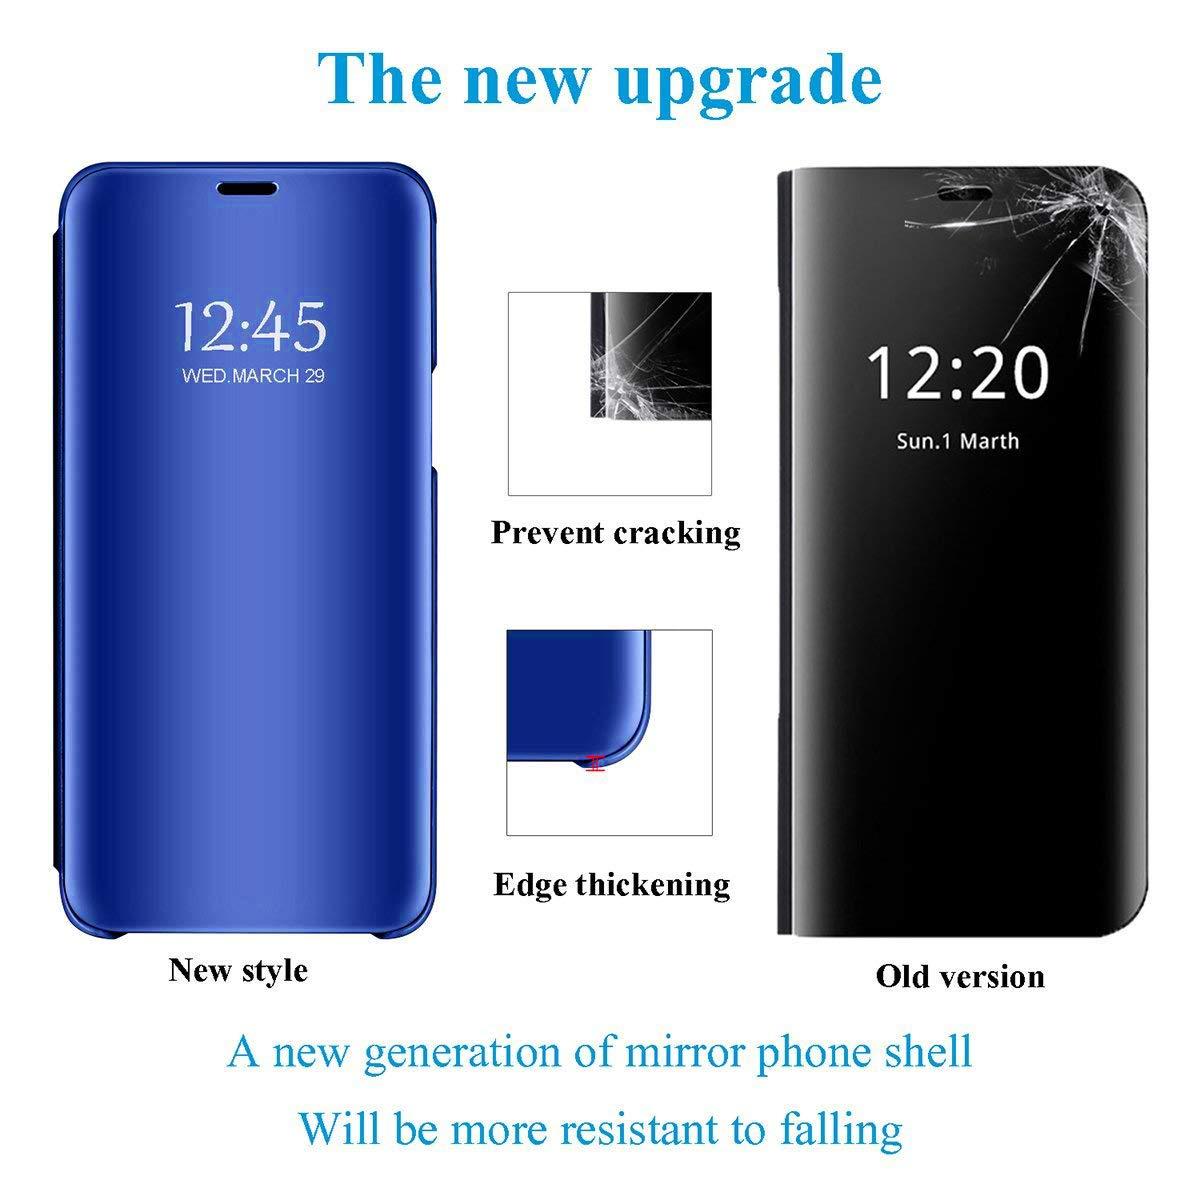 Caler H/ülle Kompatibel Samsung Galaxy A8 Star//A9 Star H/ülle Spiegel Cover Clear View Crystal Case Schutzh/ülle Mirror handyh/ülle handyhuelle etui huelle Flip metallic Frau schal mit Tasche Ledertasche